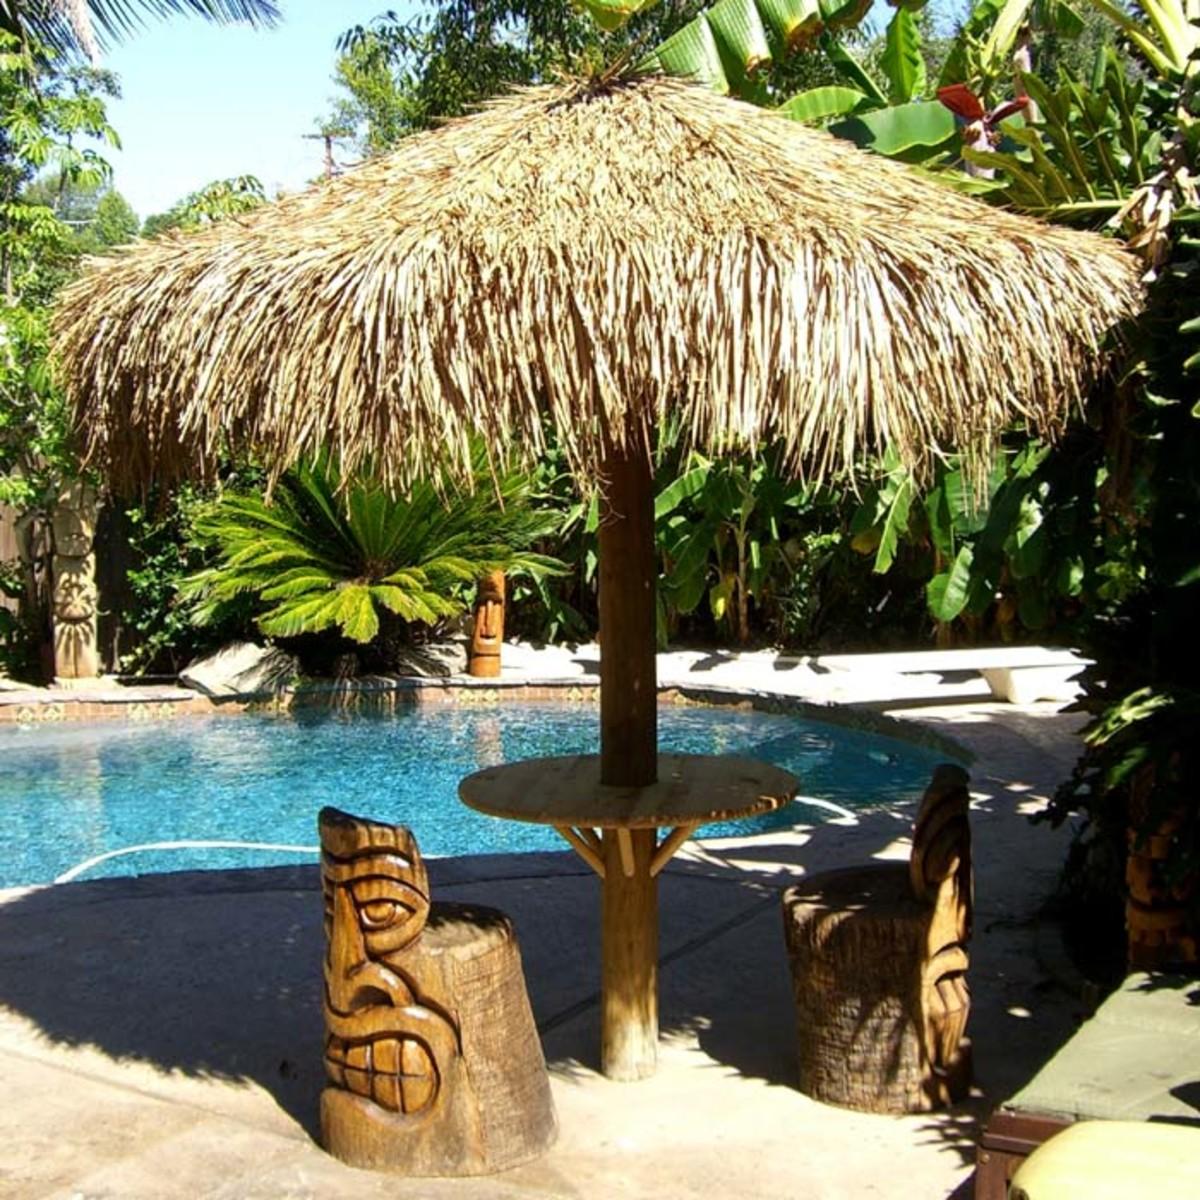 1000+ images about Palapa Ideas on Pinterest | Roof ideas ... on Palapa Bar Backyard id=53544